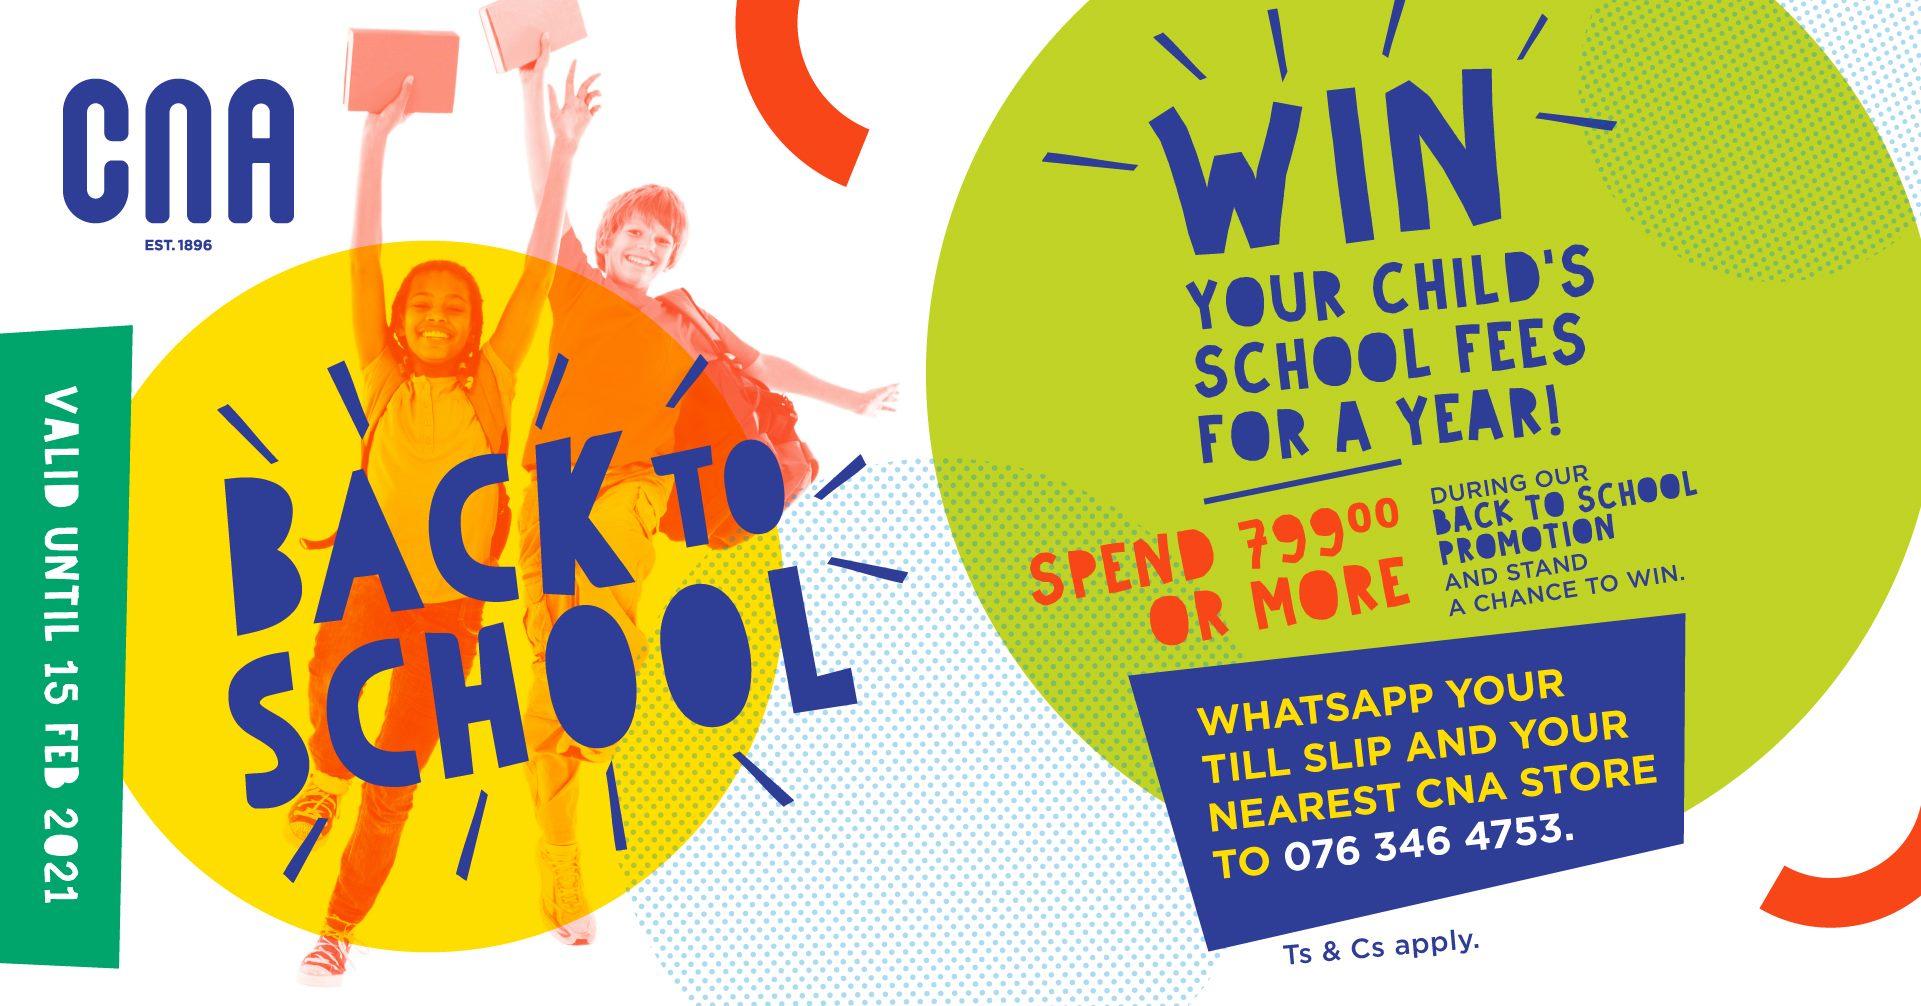 Cna Back To School Campaign